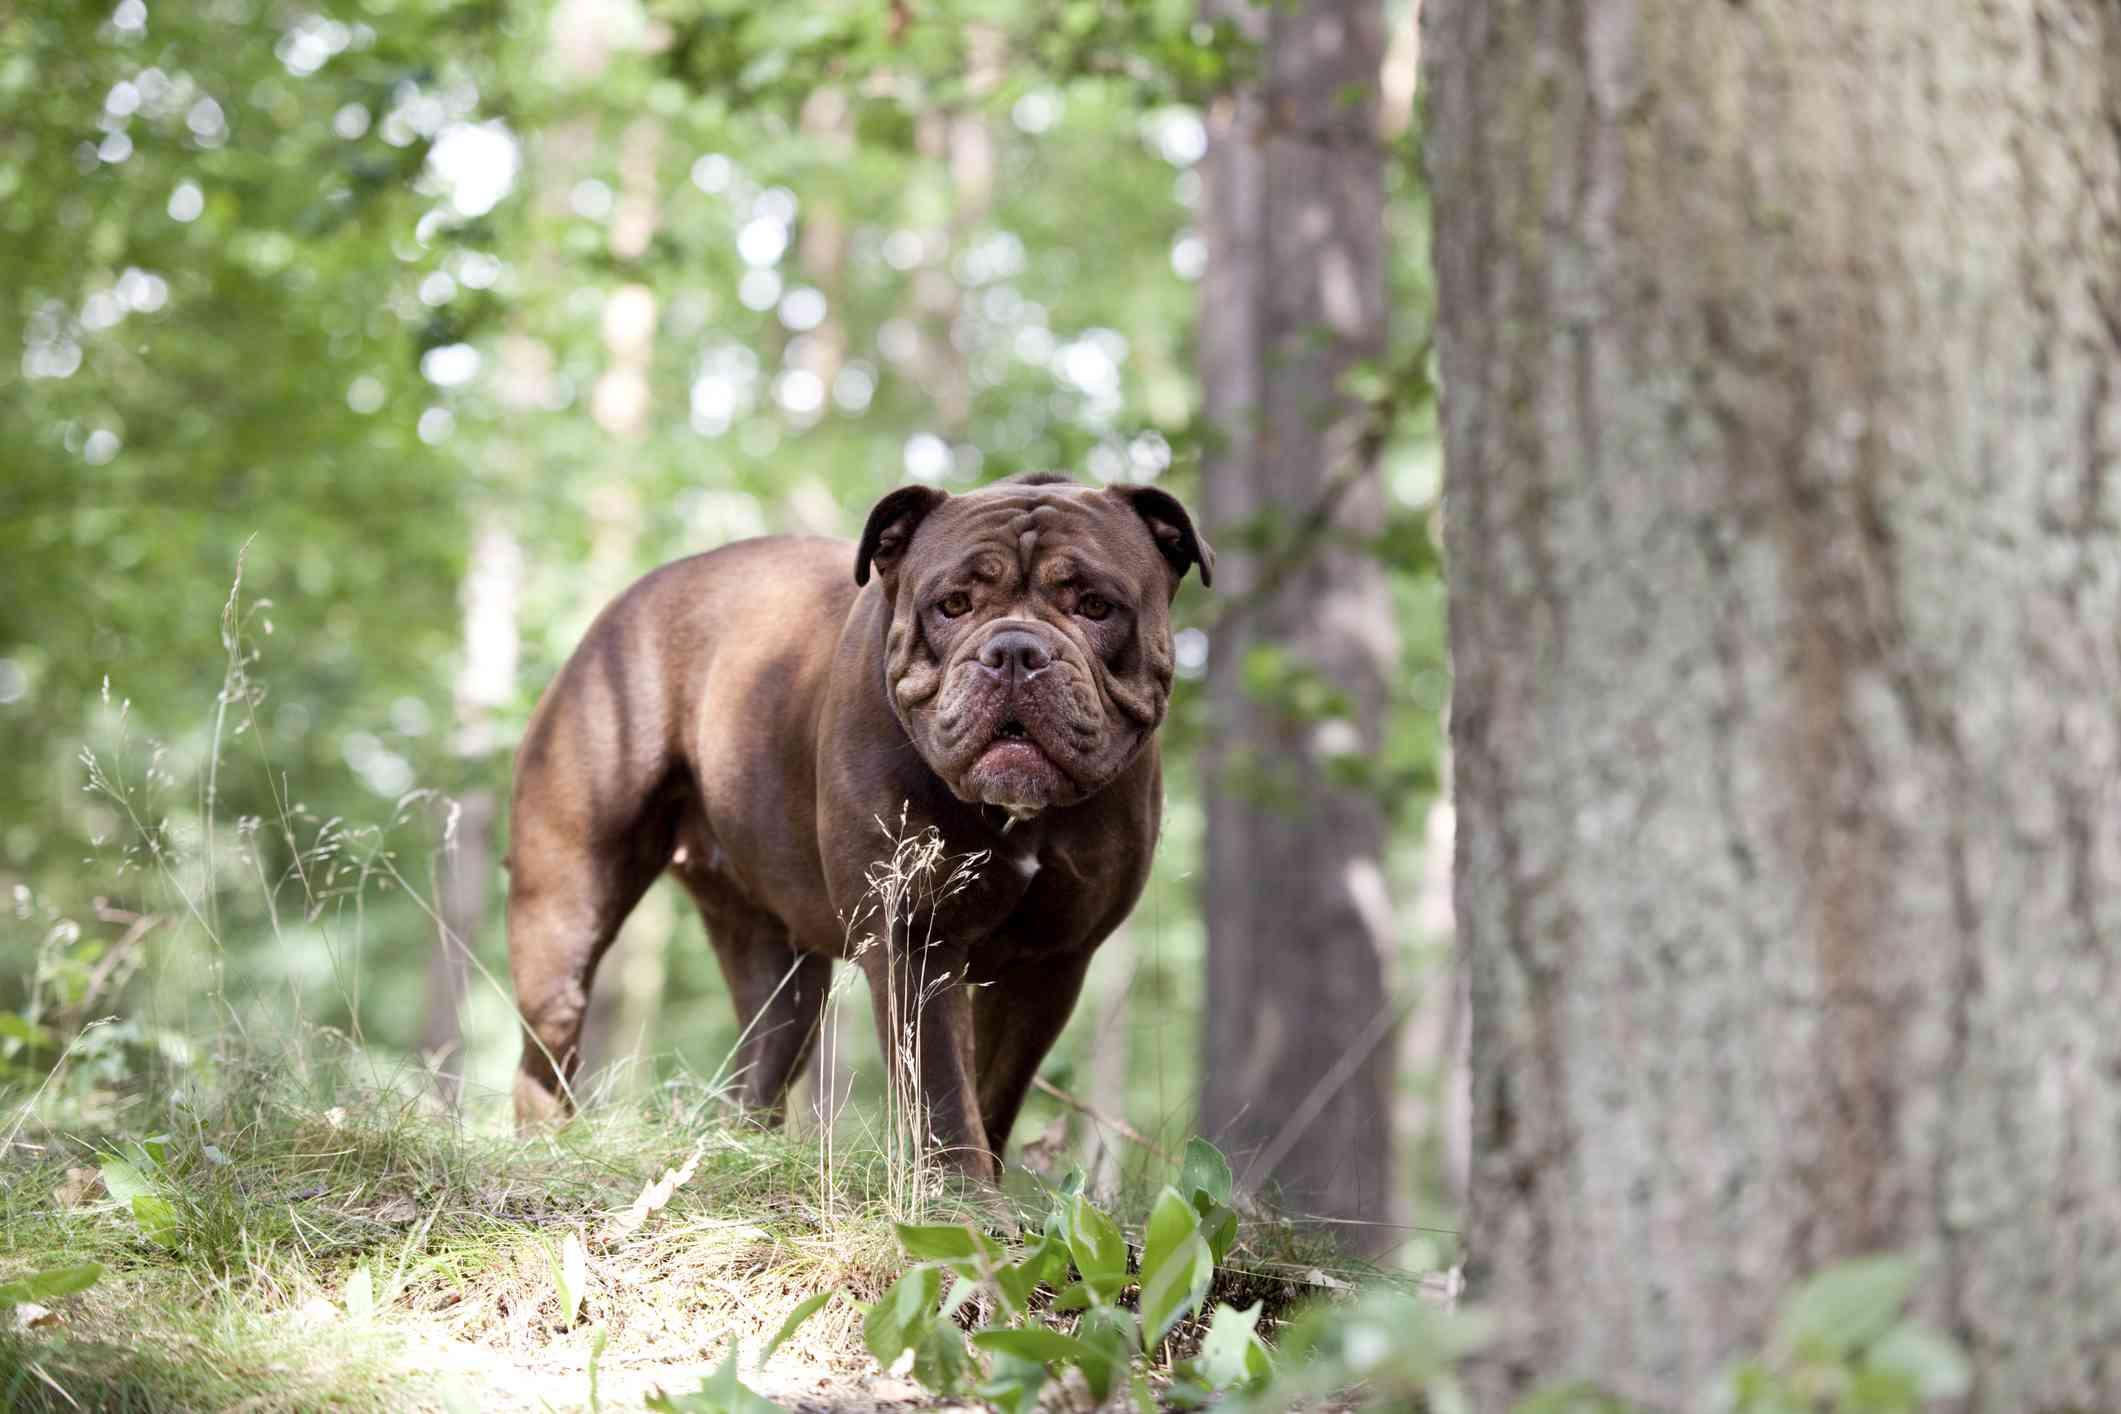 Bulldogge inglés antiguo